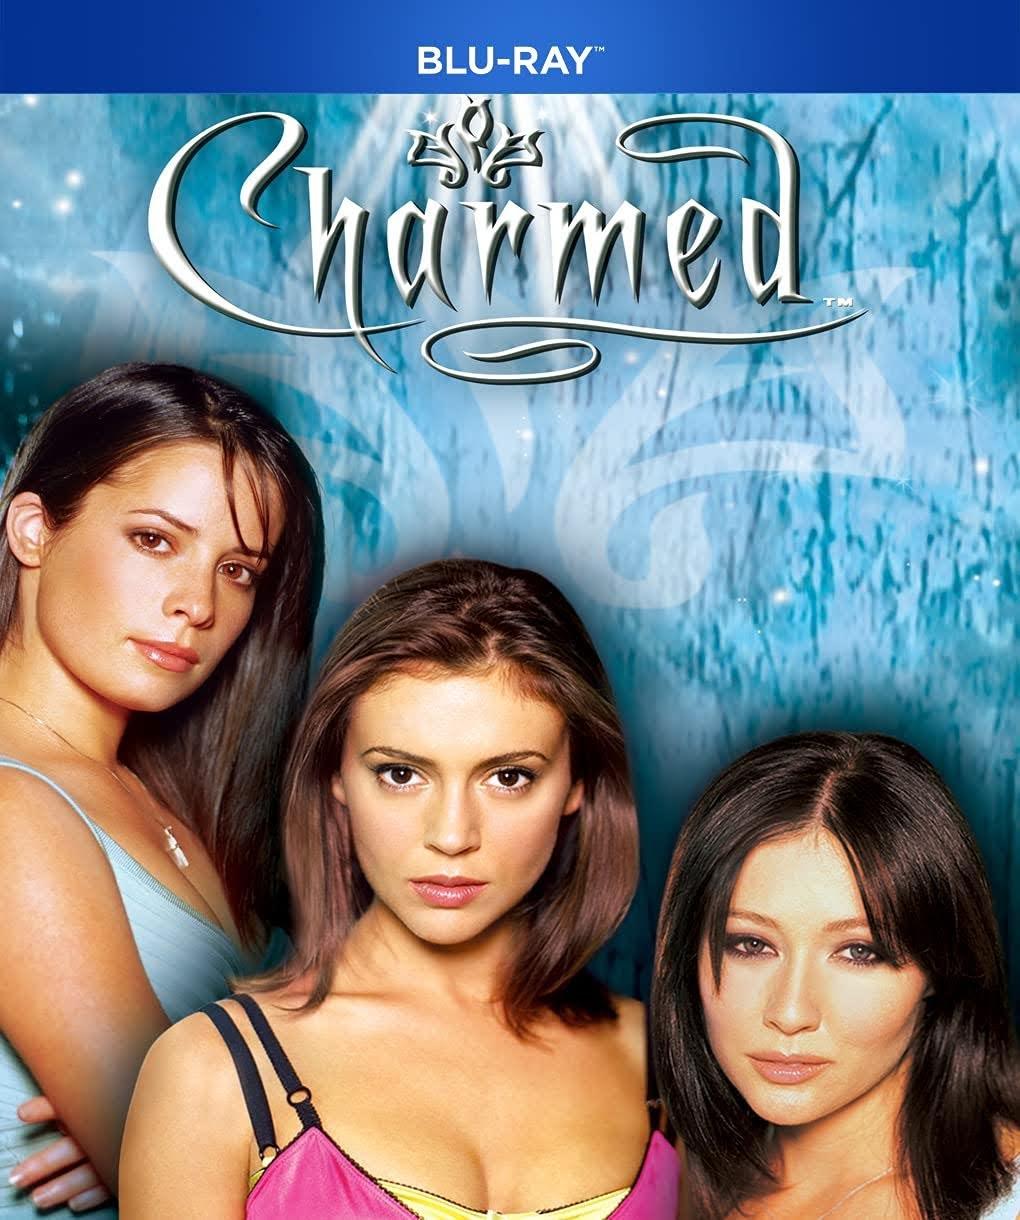 Charmed – Temporada 3 [5xBD25] *Con Audio Latino – Exclusivo Masterbluray